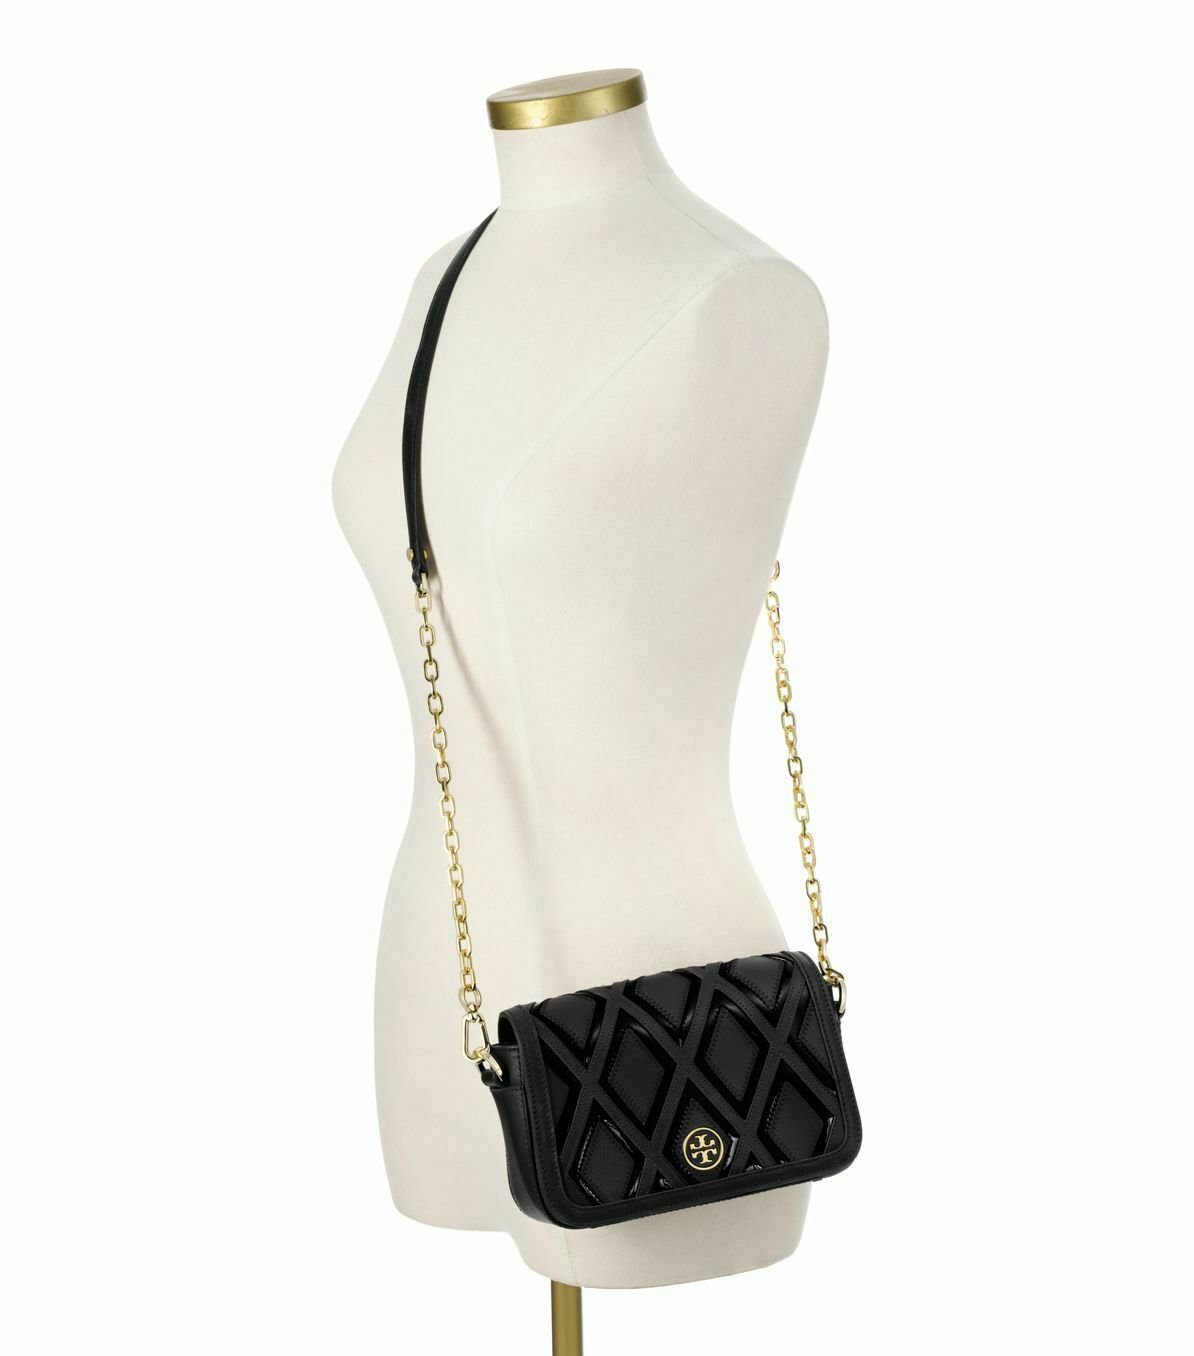 NWT Tory Burch Robinson Patchwork Chain Bag $435